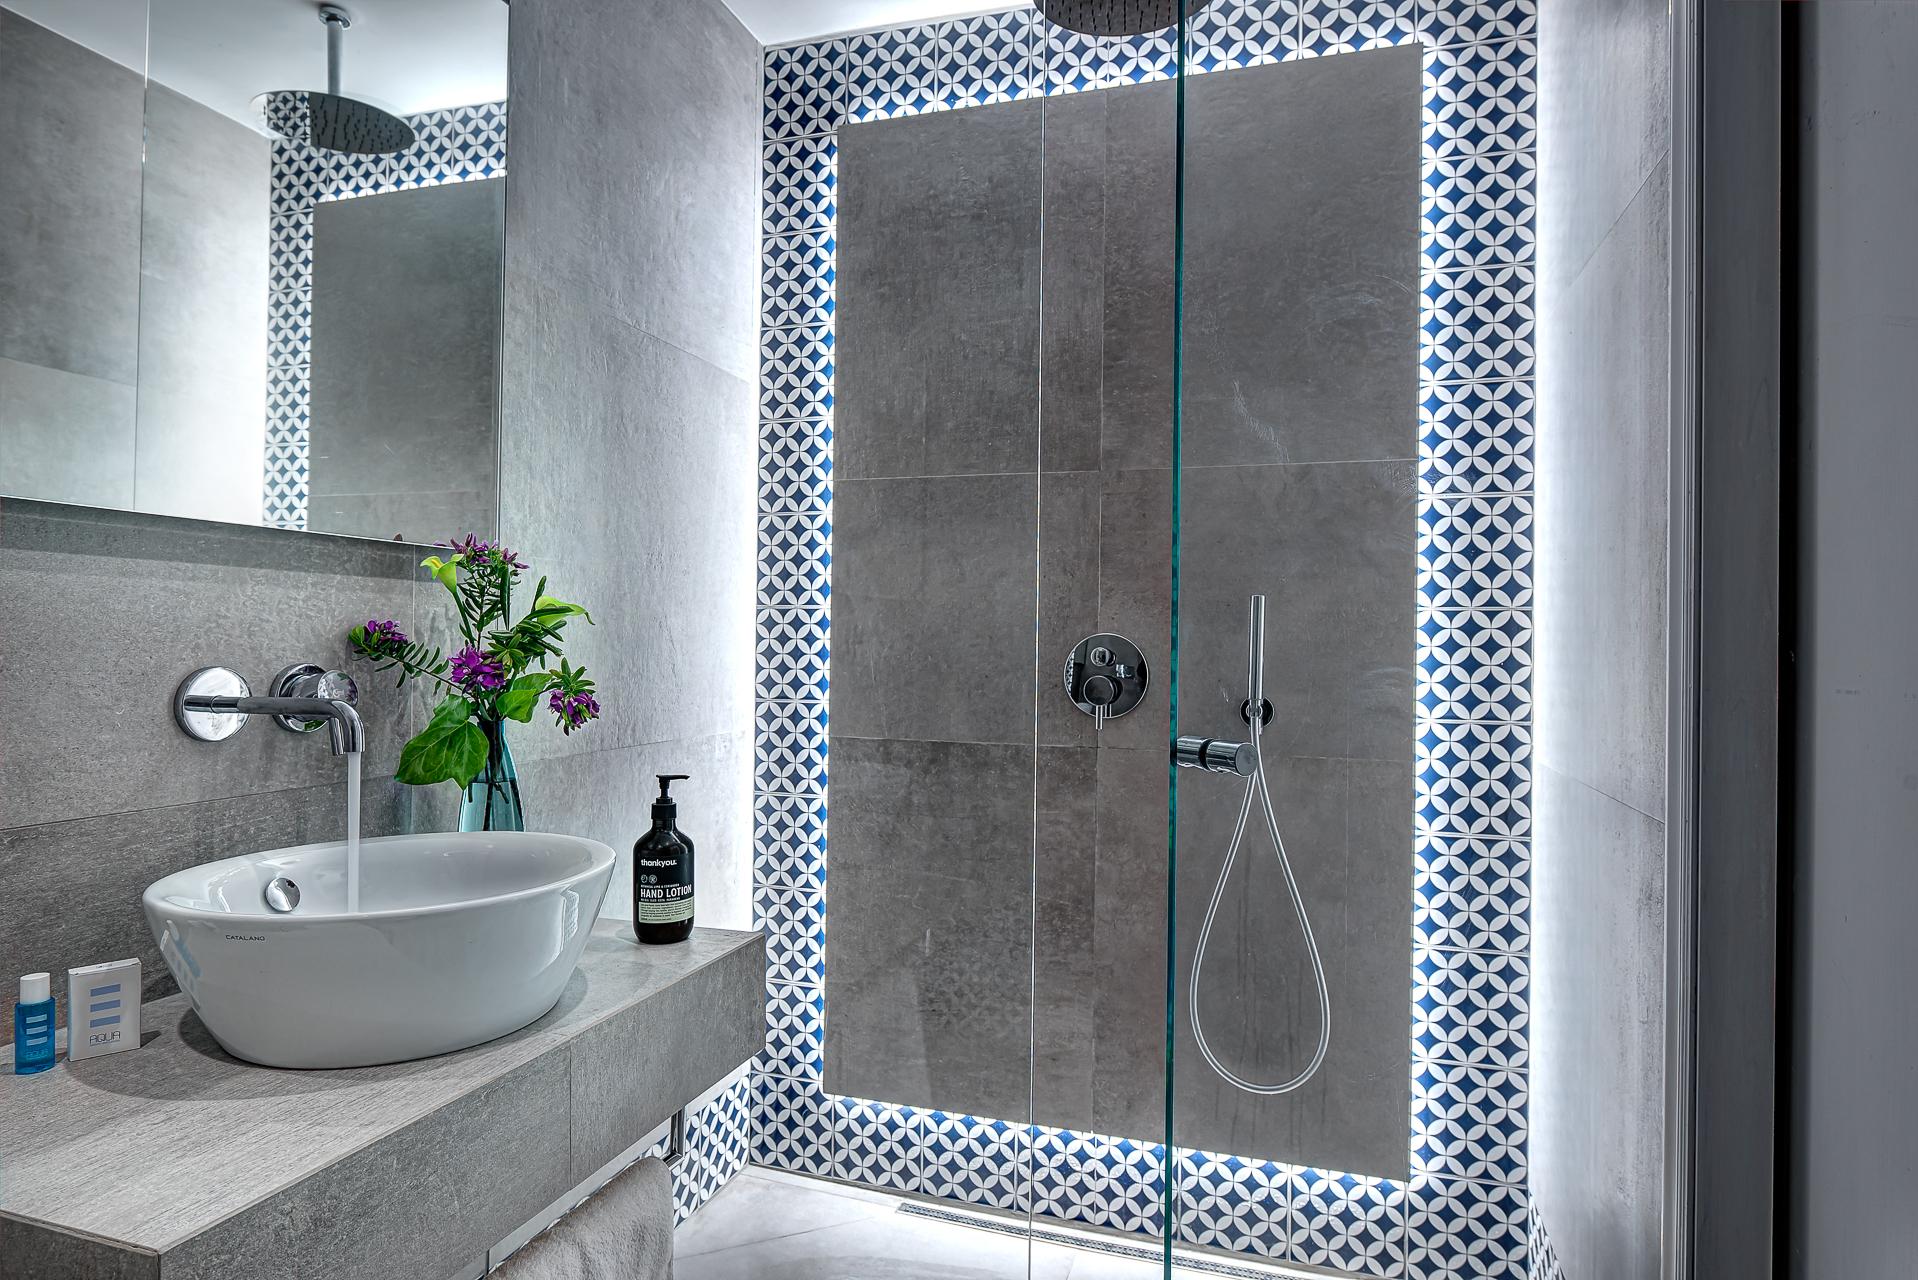 gocce di capri three bedroom apatment classic sorrento shower